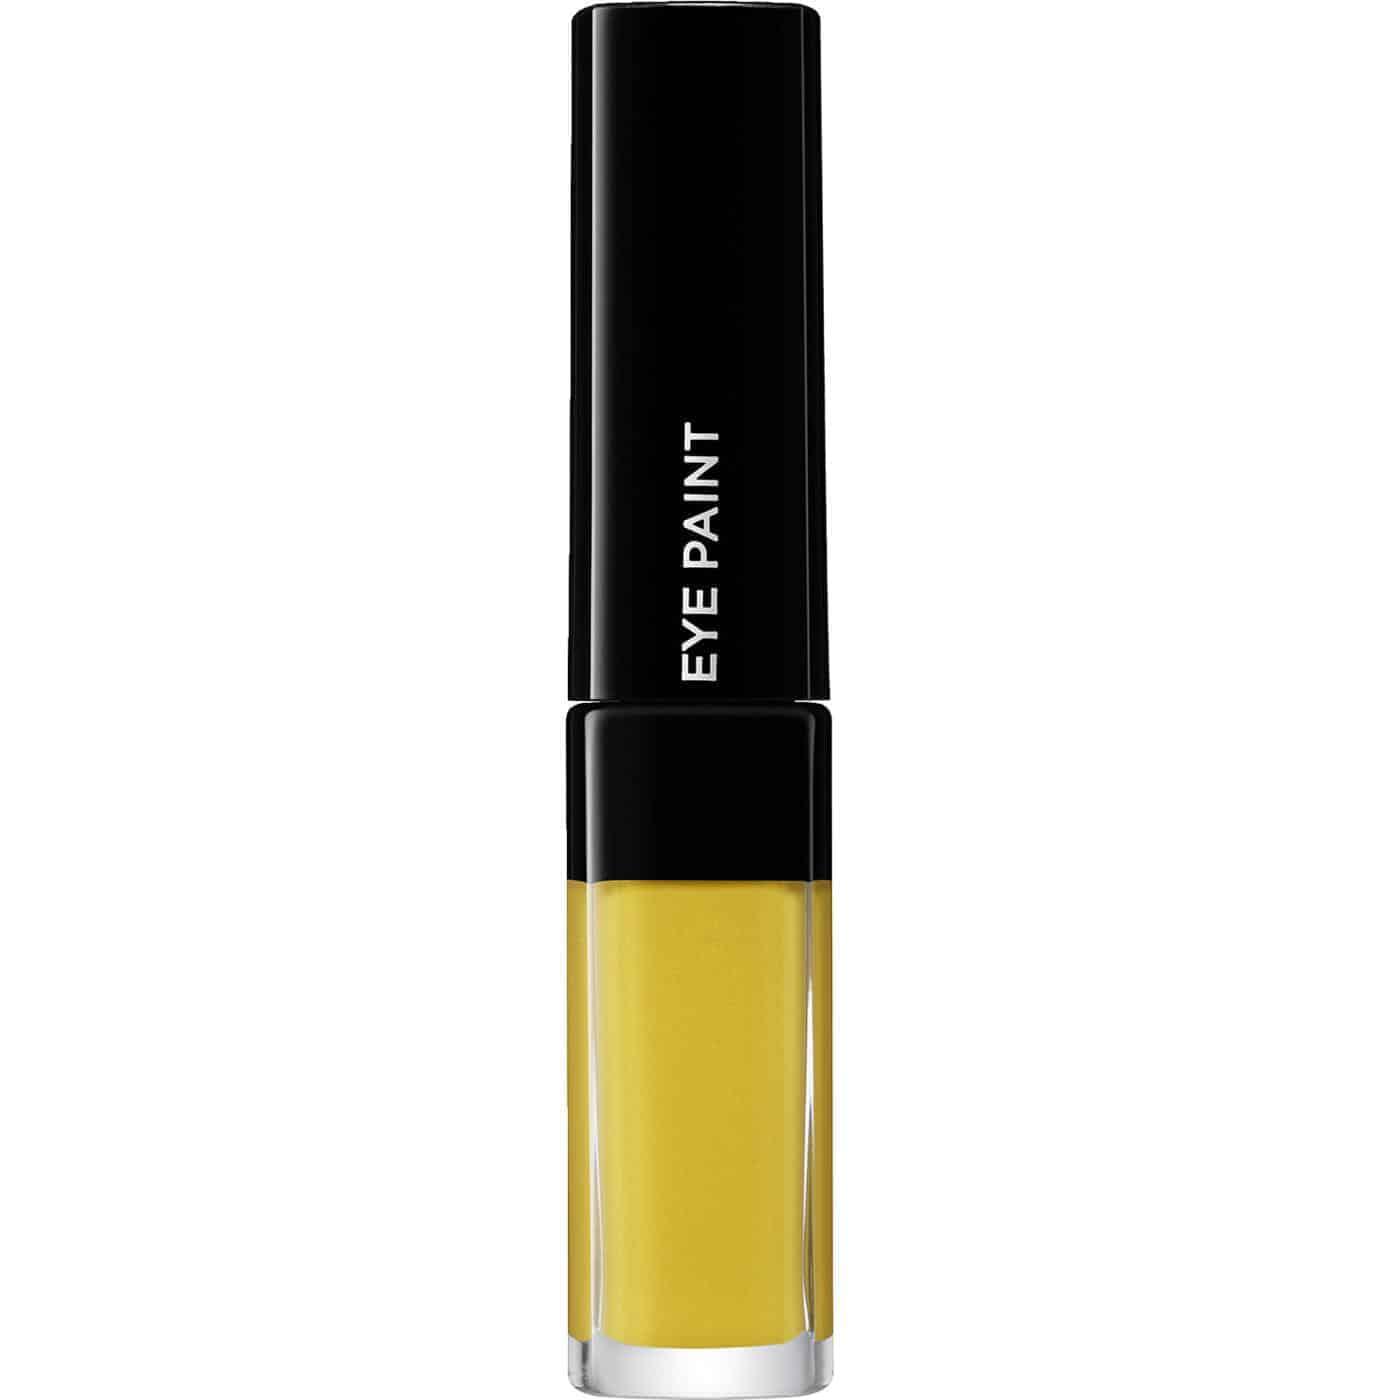 Течни Сенки за Очи L'Oréal Infallible 108 Lime Me Now